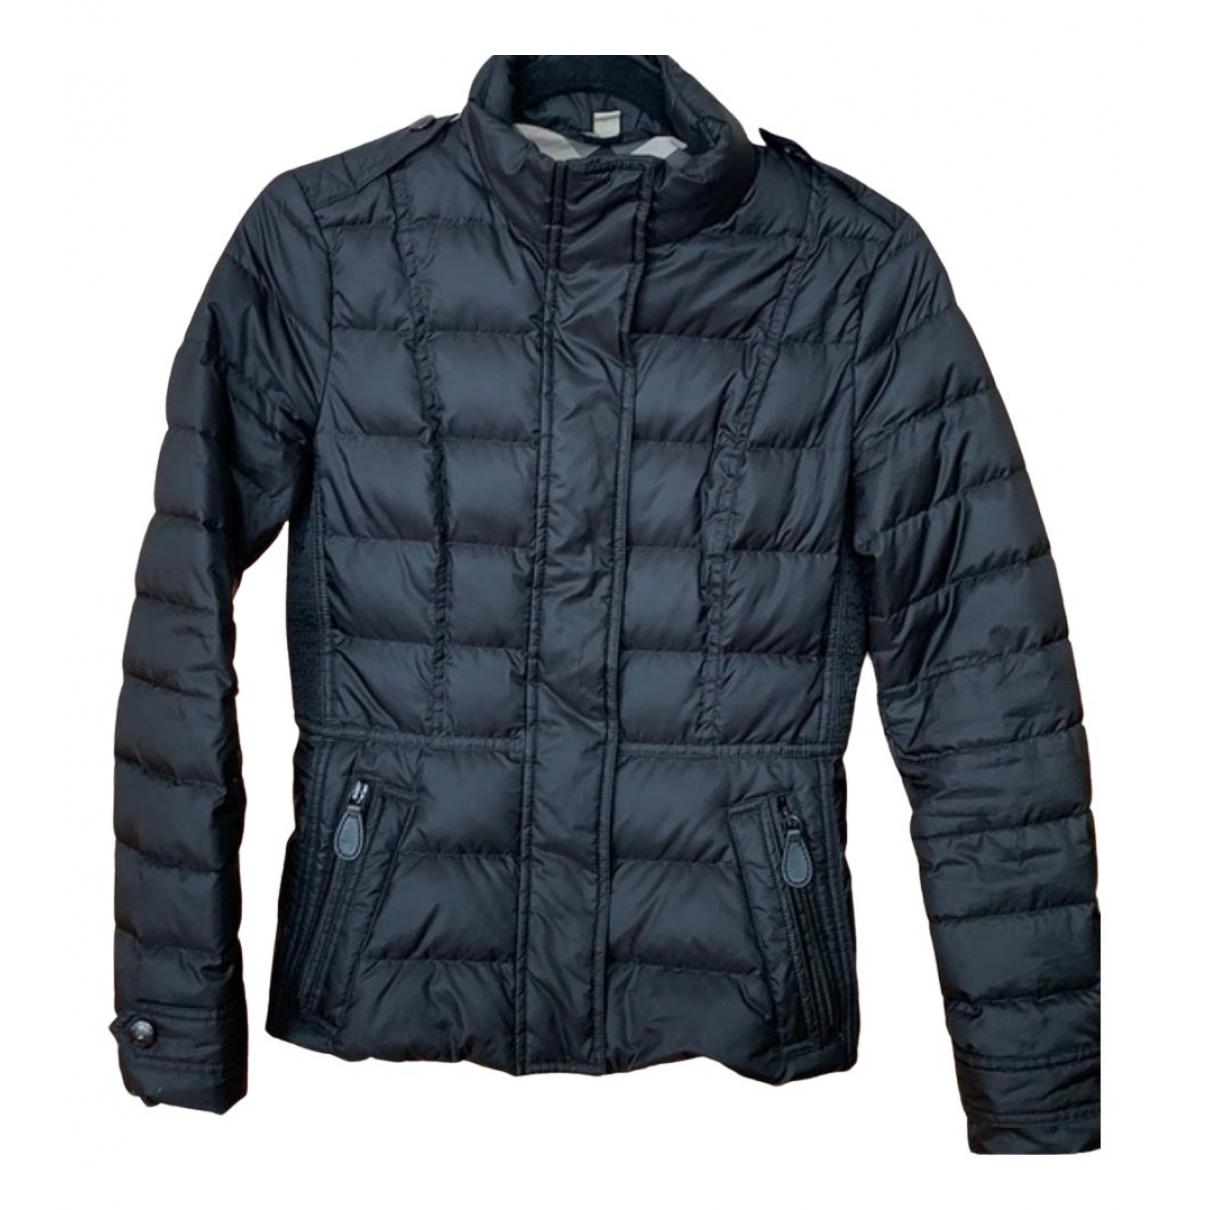 Burberry \N Jacke in  Schwarz Polyester